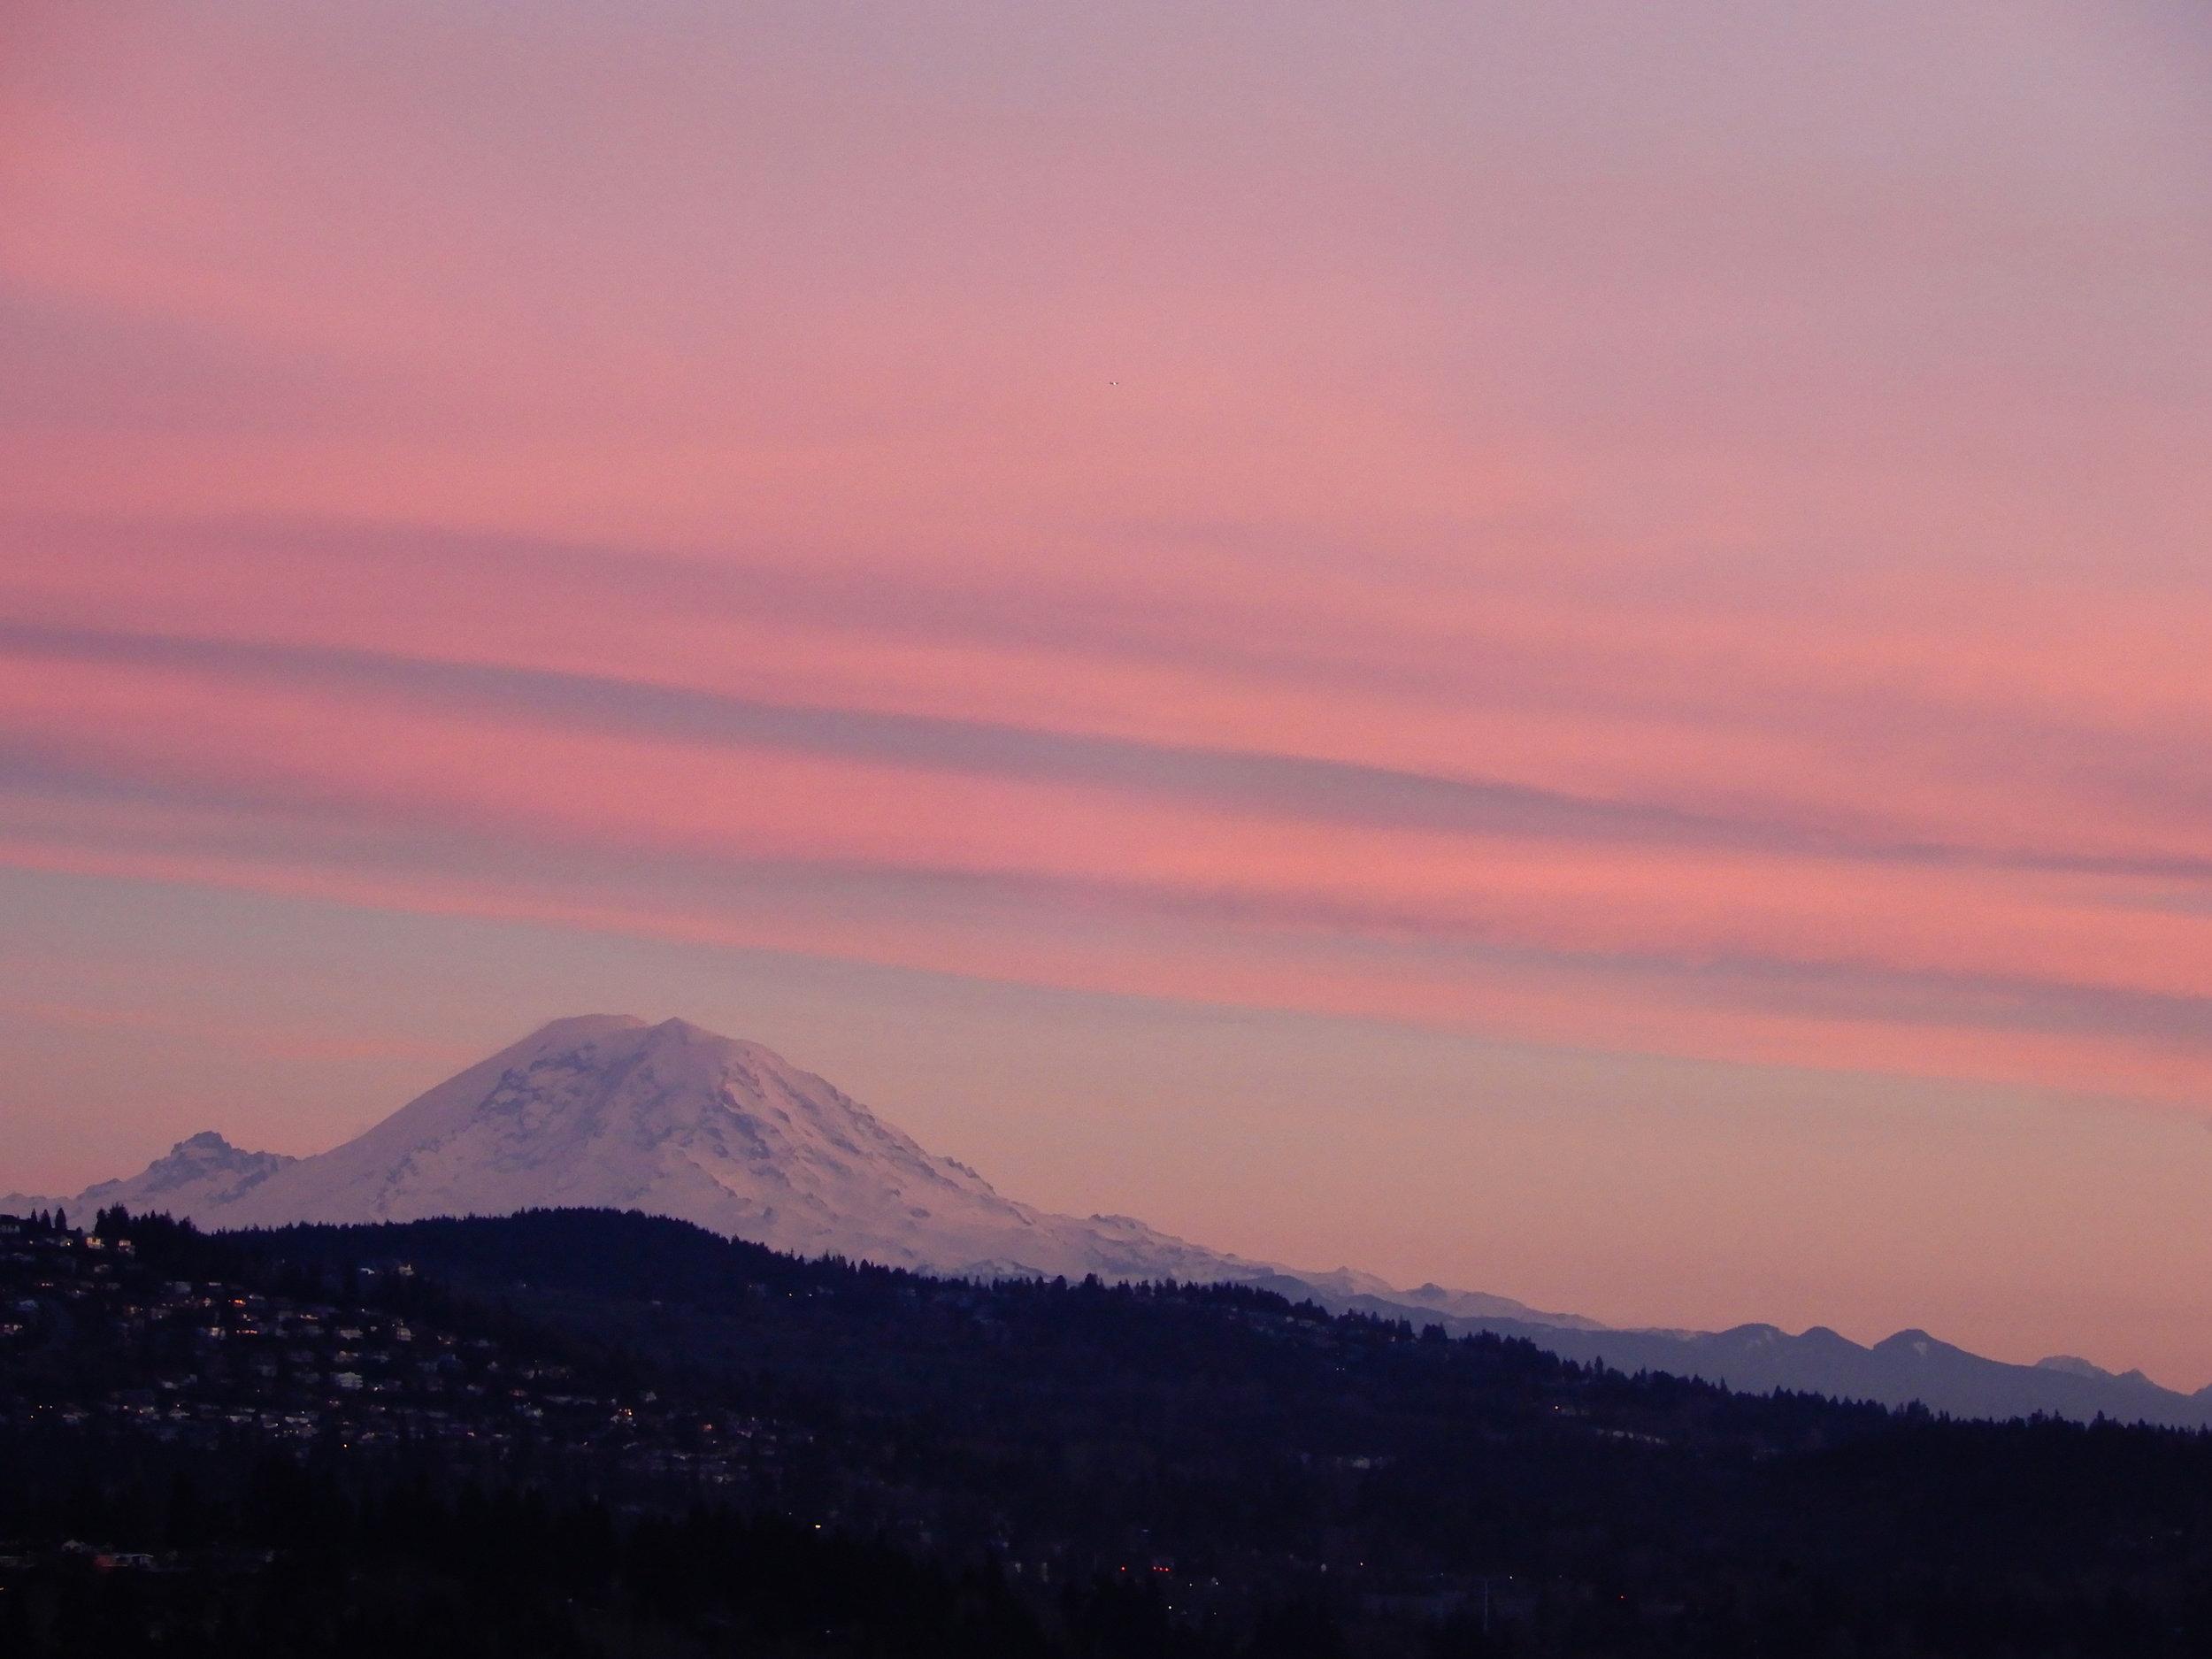 A Pacific Northwest treat: Mt. Ranier at sunset.  (Photo Credit: Douglas Bors)